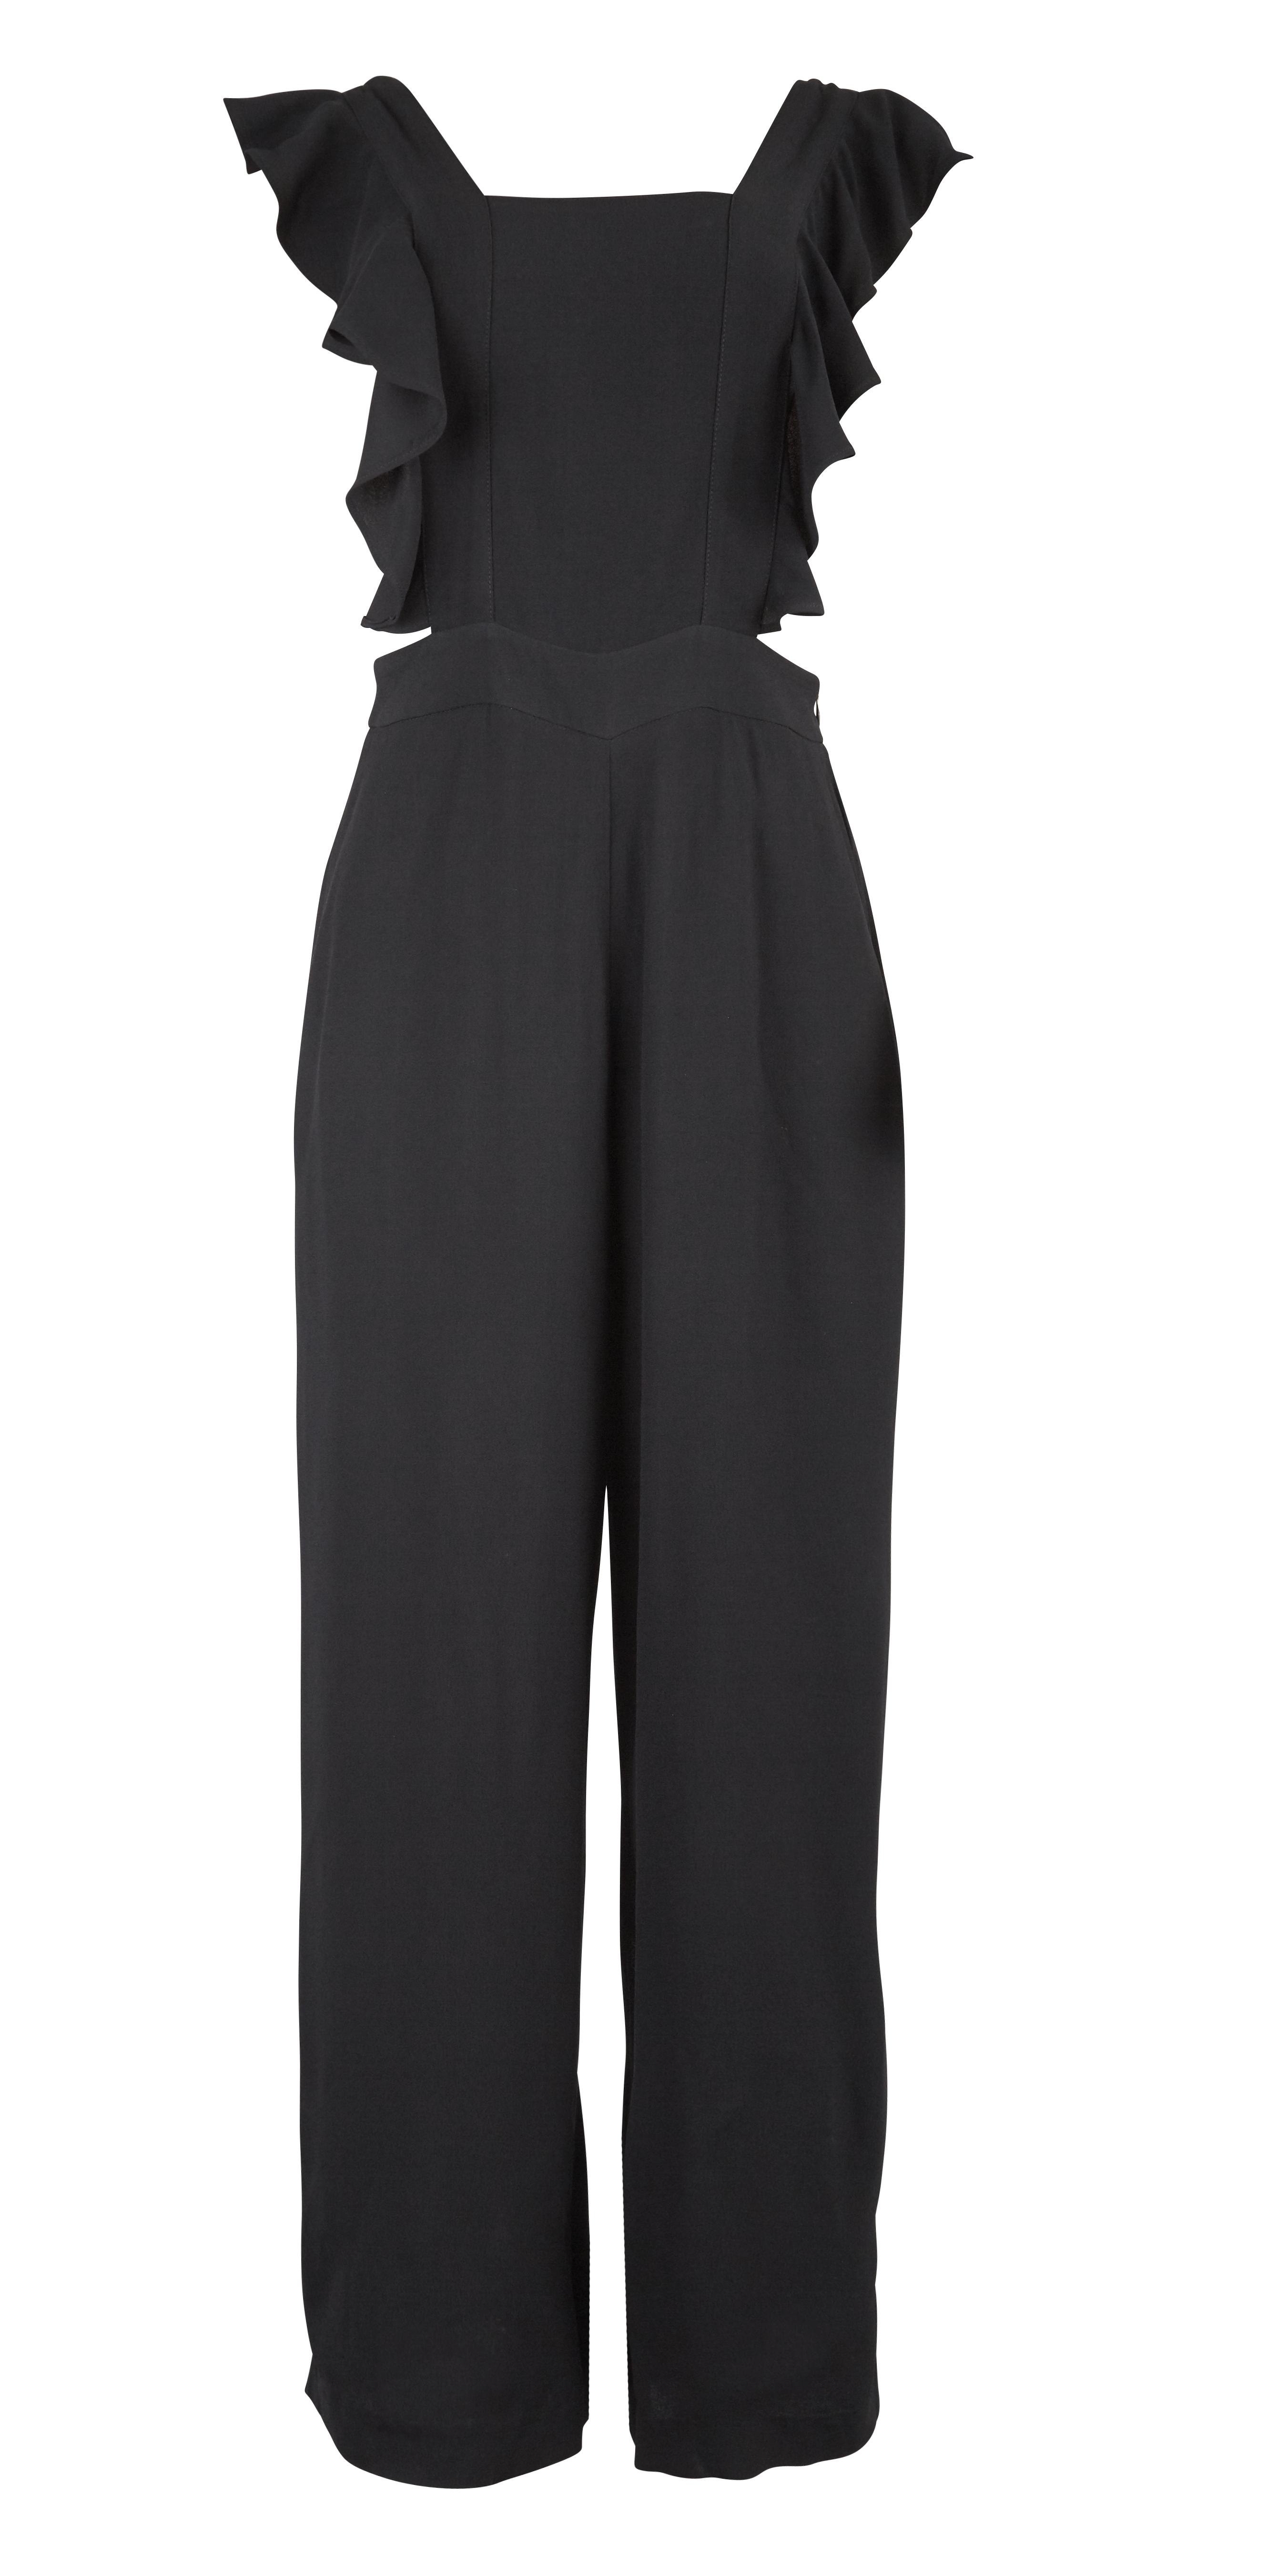 5dd265e0 Sort jumpsuit til dame – Rue de Femme sort jumpsuit Kelize – Mio Trend